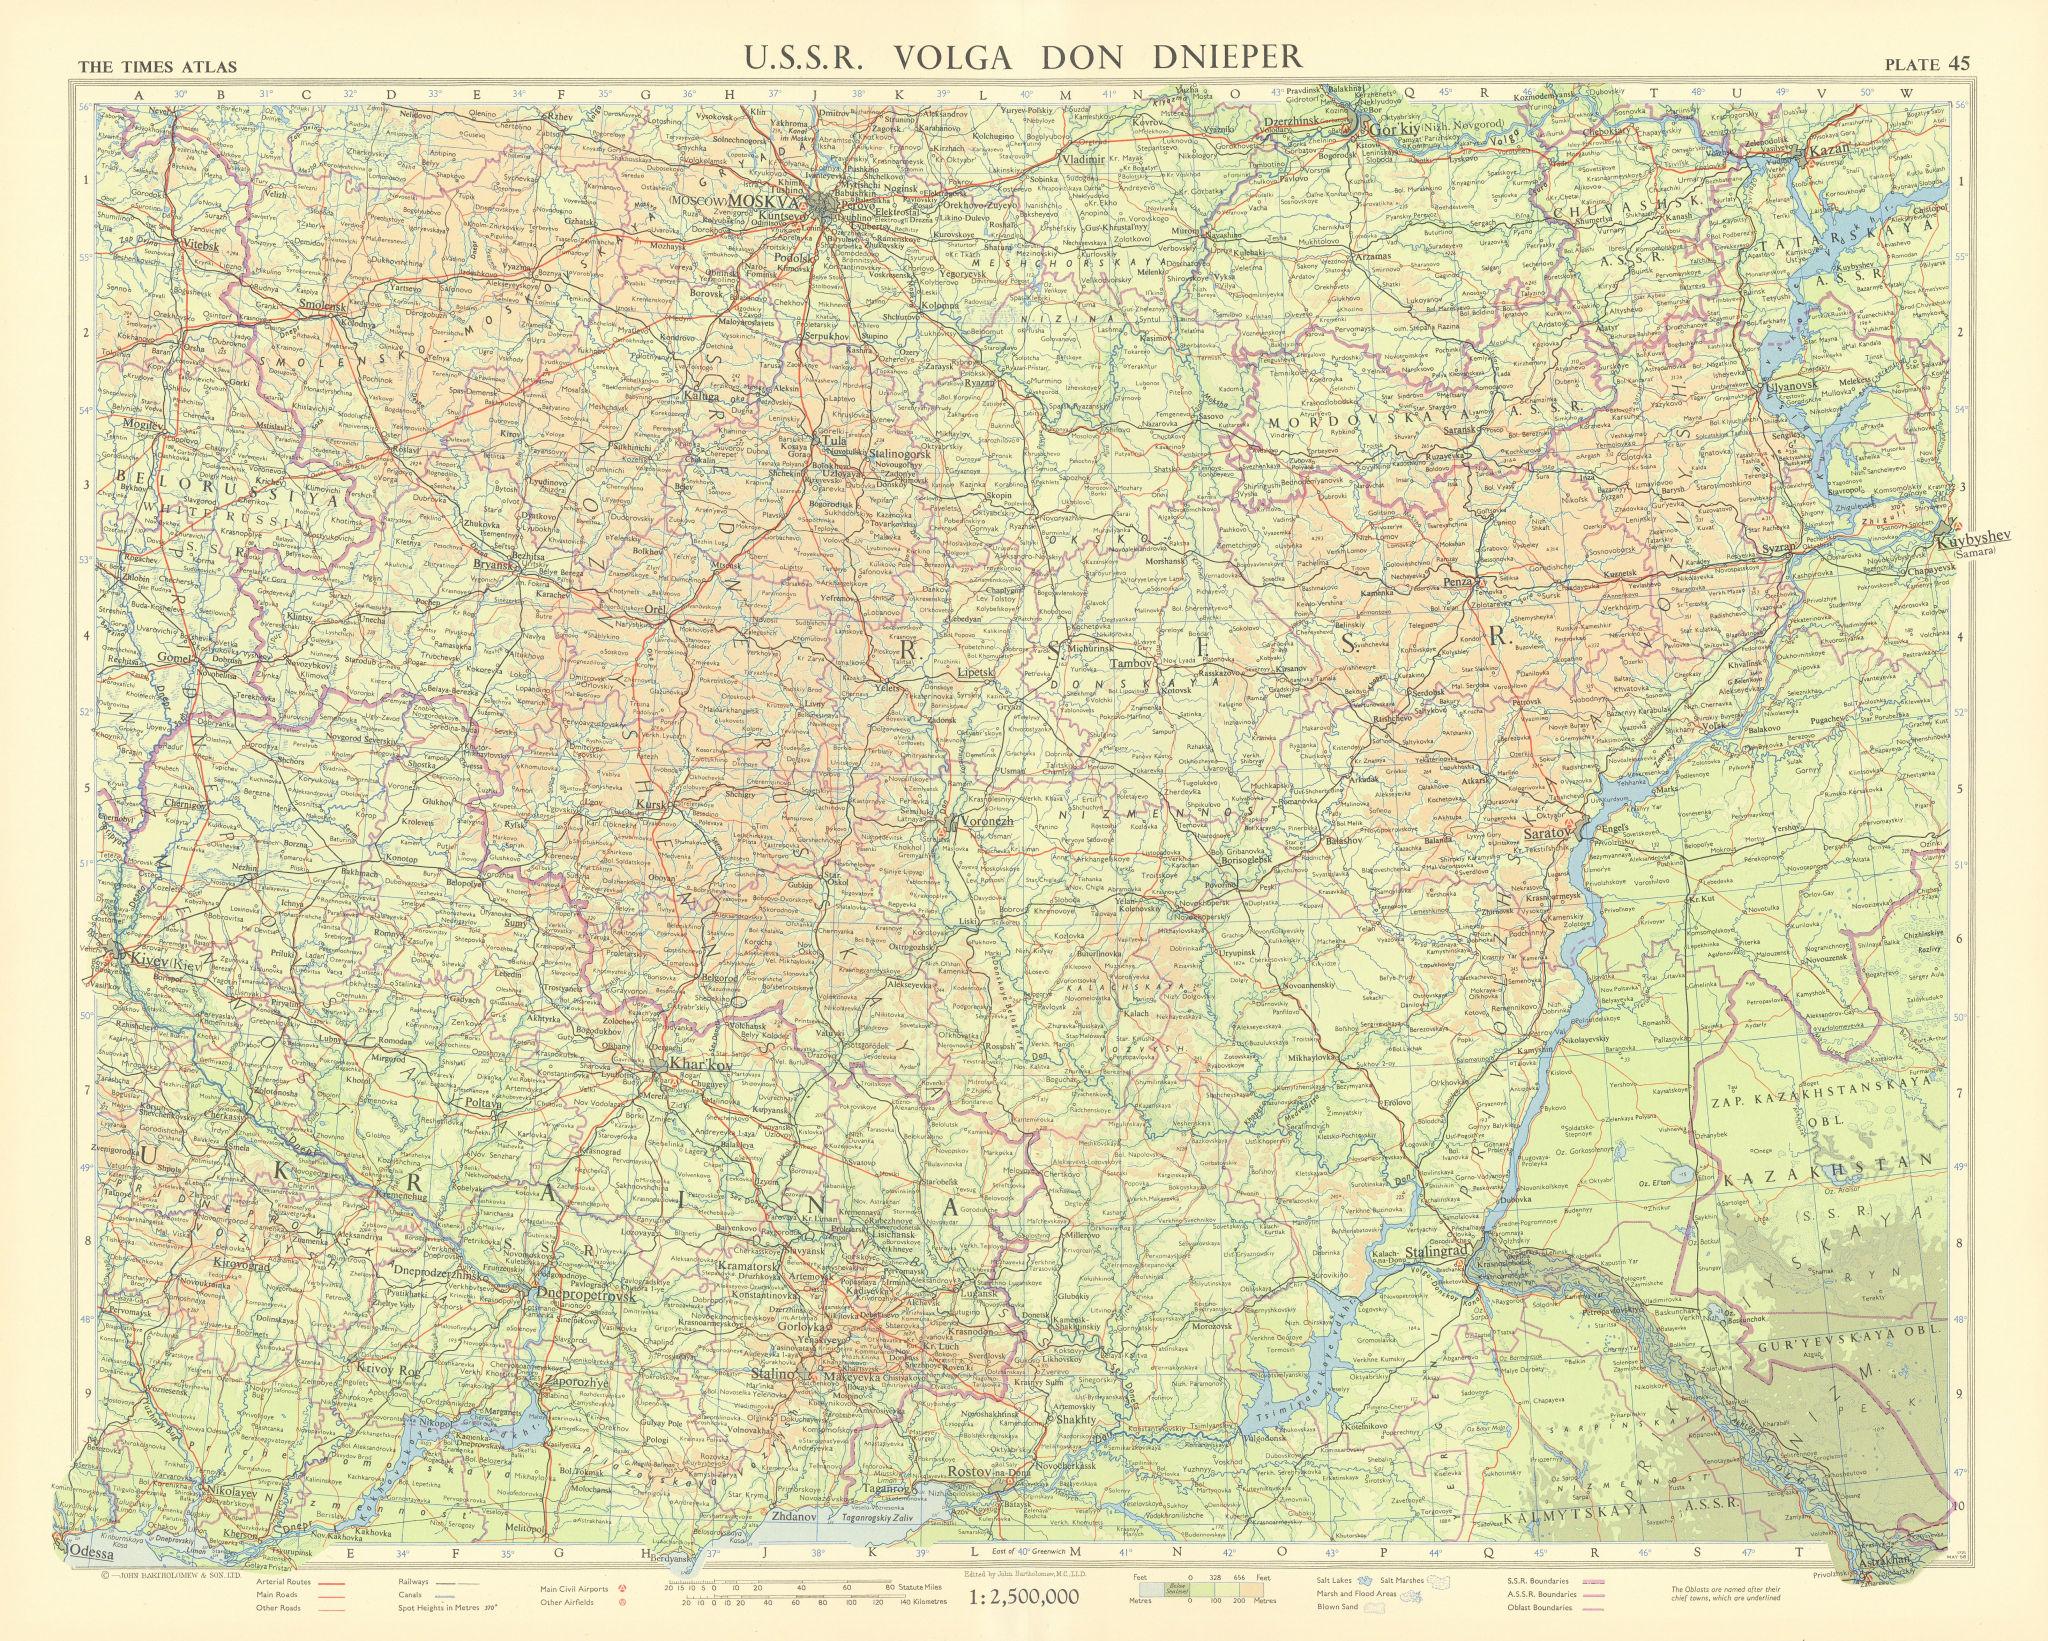 Southern Russia. NE Ukraine. USSR. Volga Don Dnieper. TIMES 1959 old map